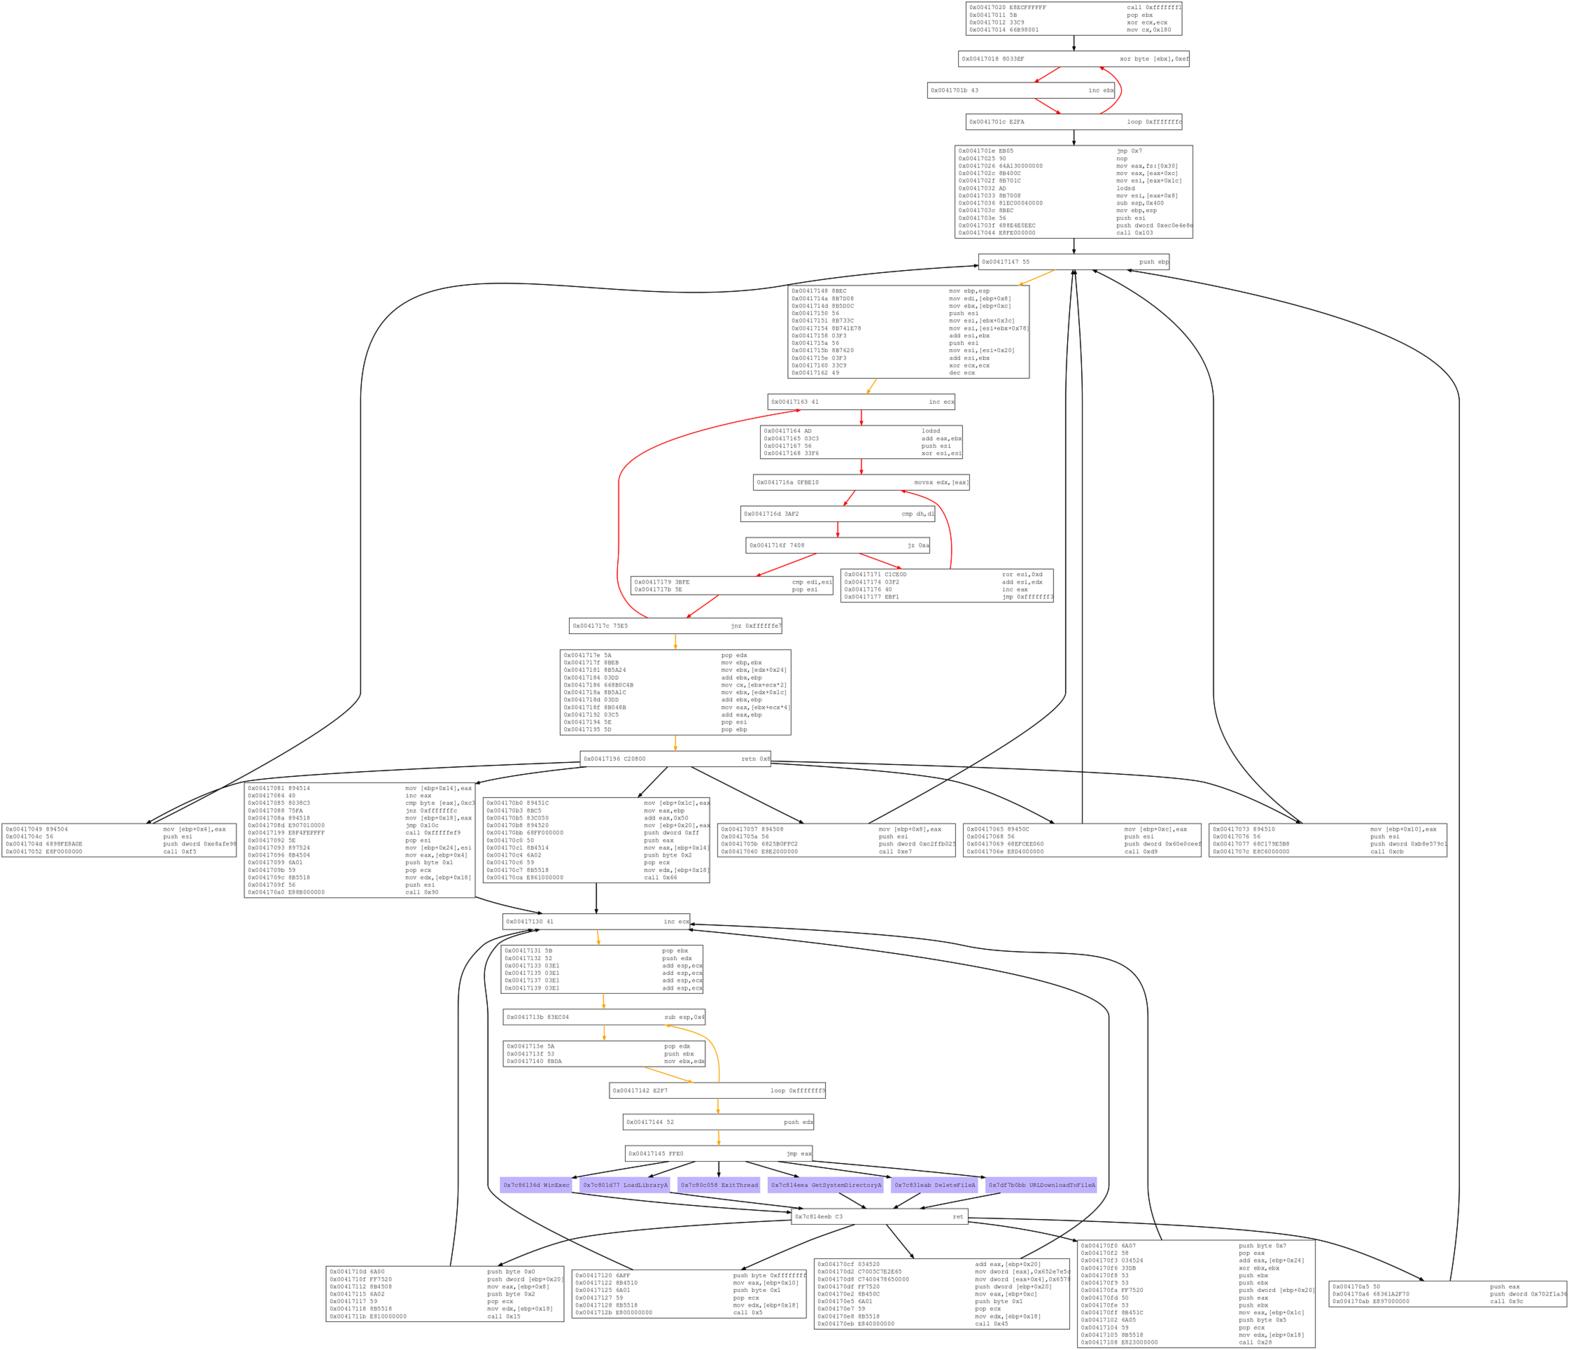 Libemu sctest' output, created from PDF shellcodes